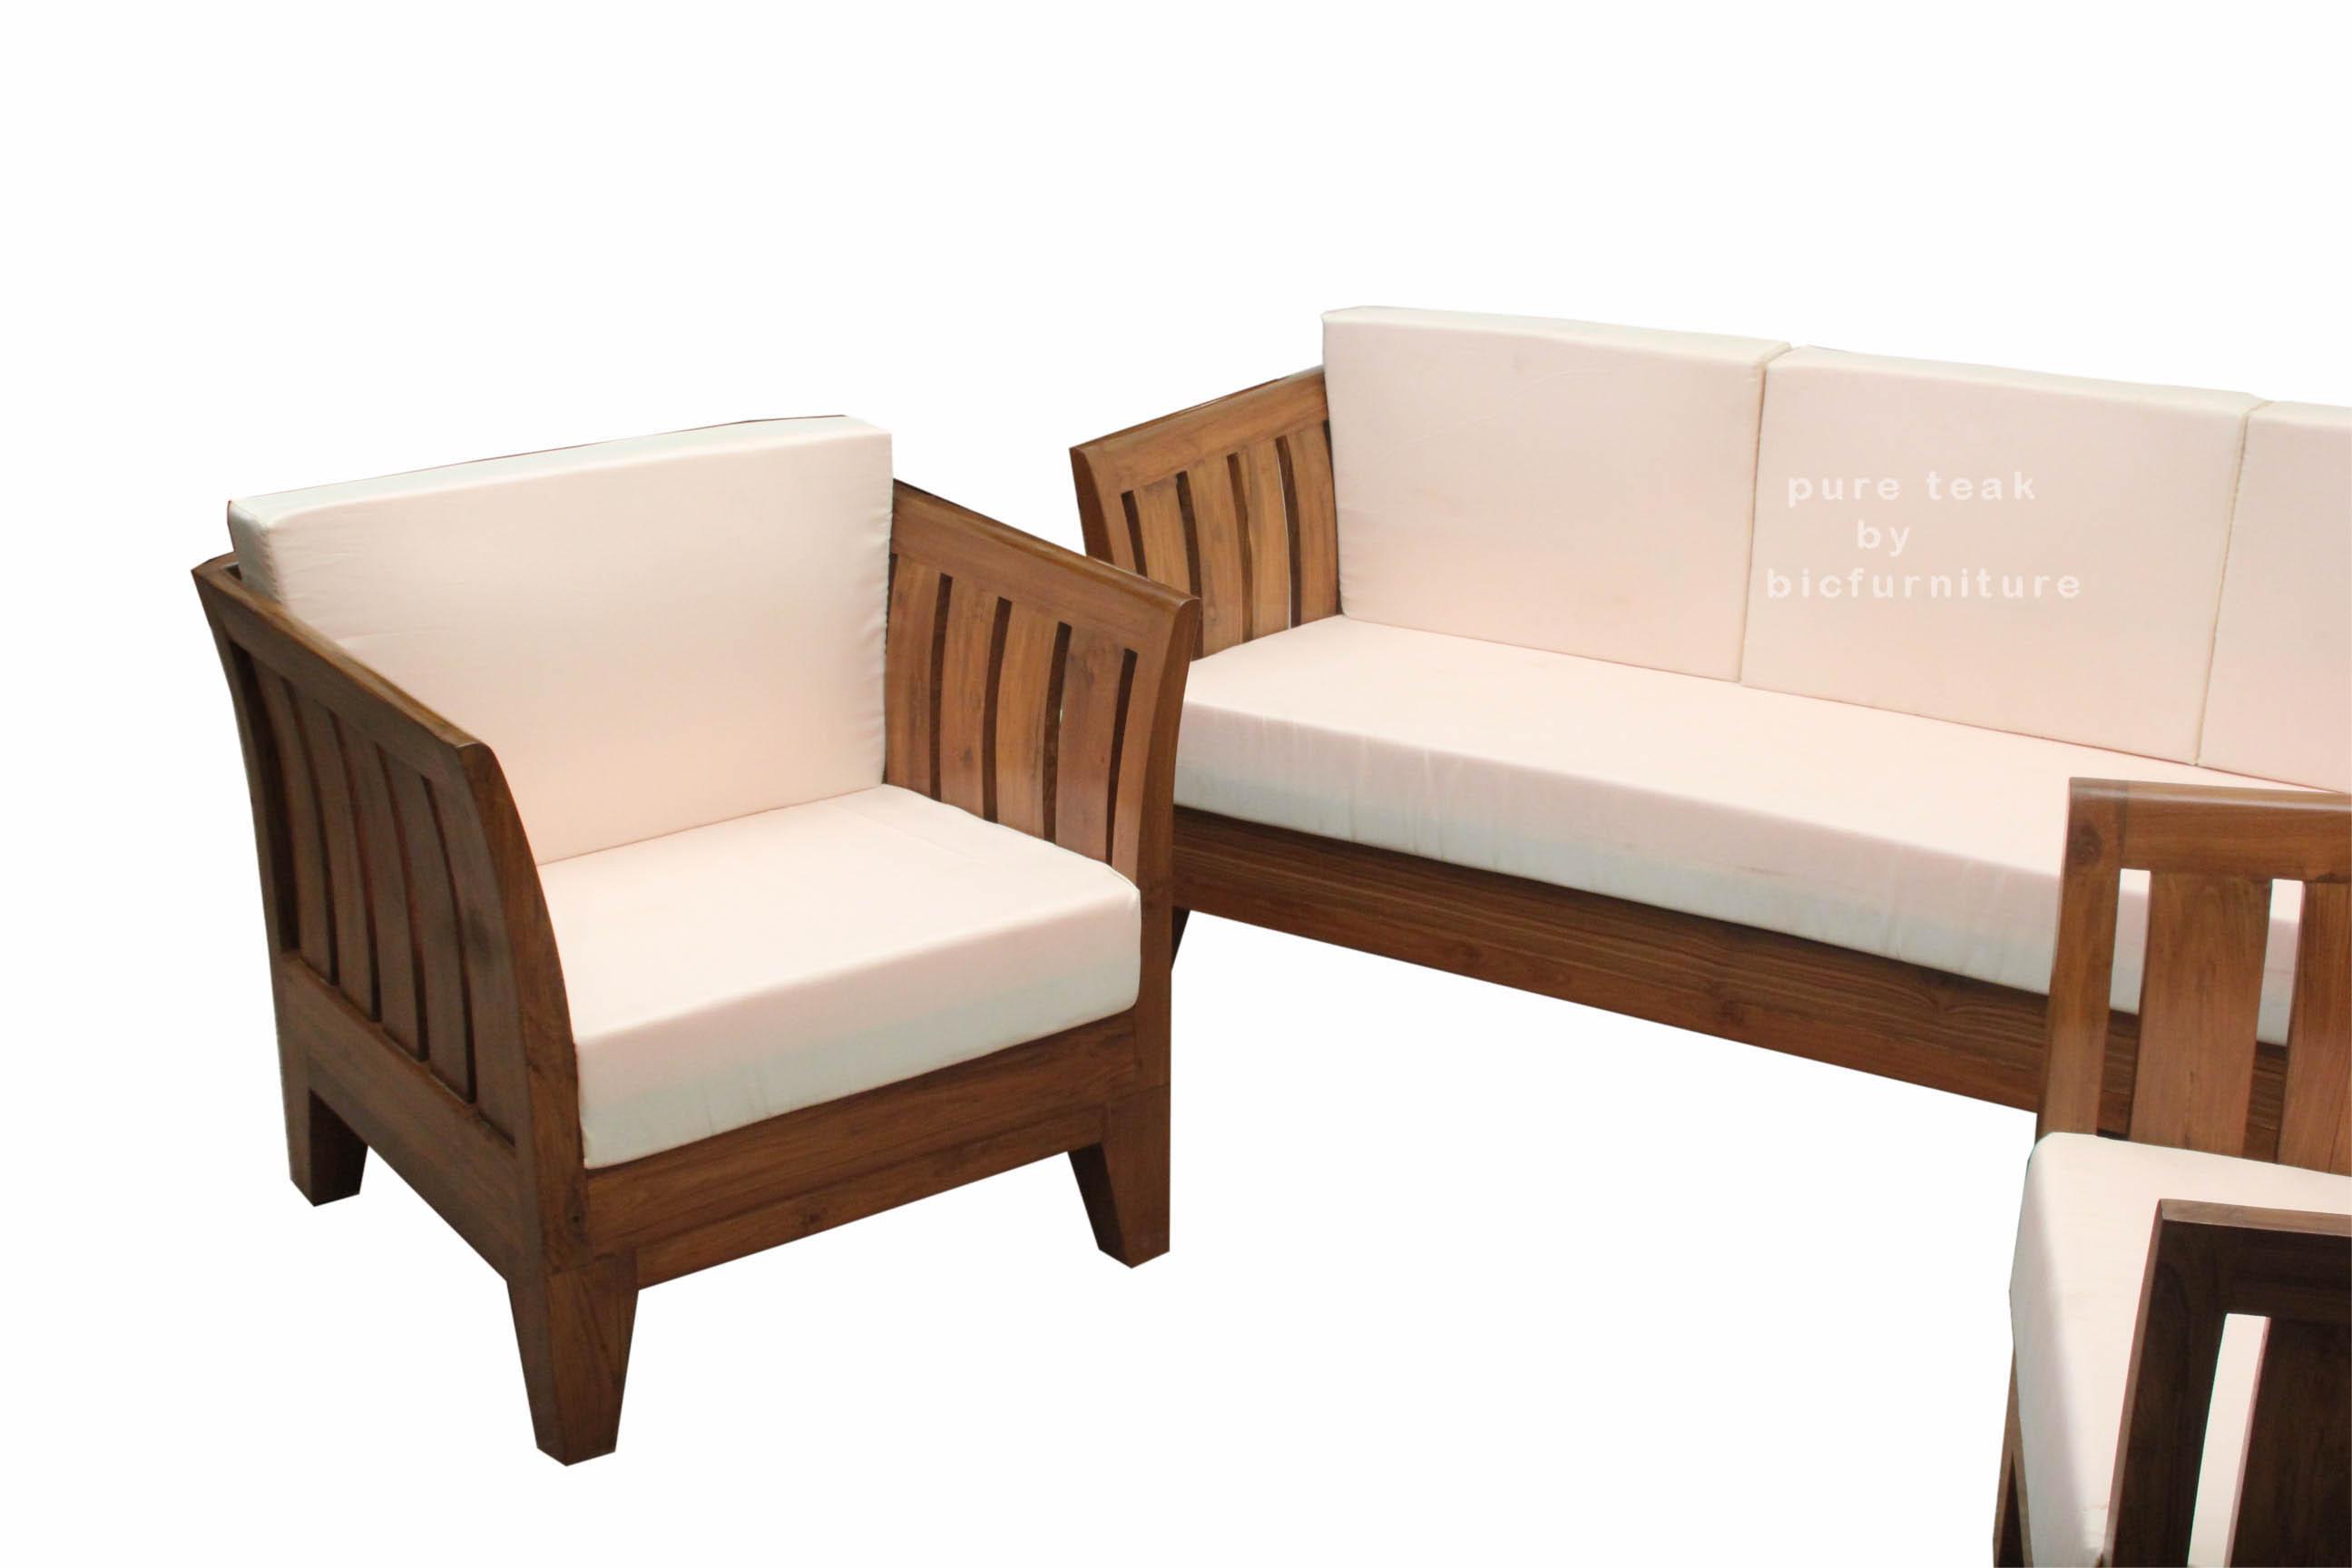 Teak Wood Sofa Set Ws 60 Details Bic Furniture India